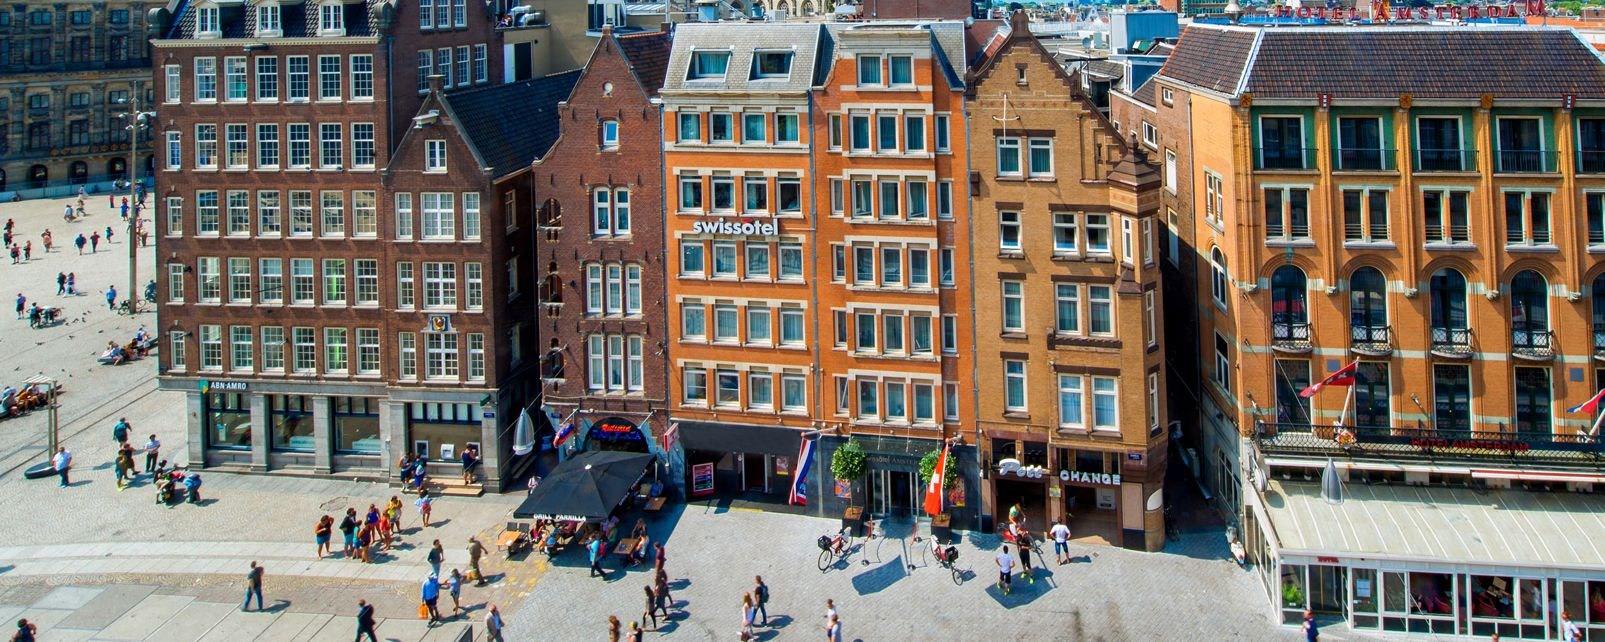 Hôtel Swissotel Amsterdam